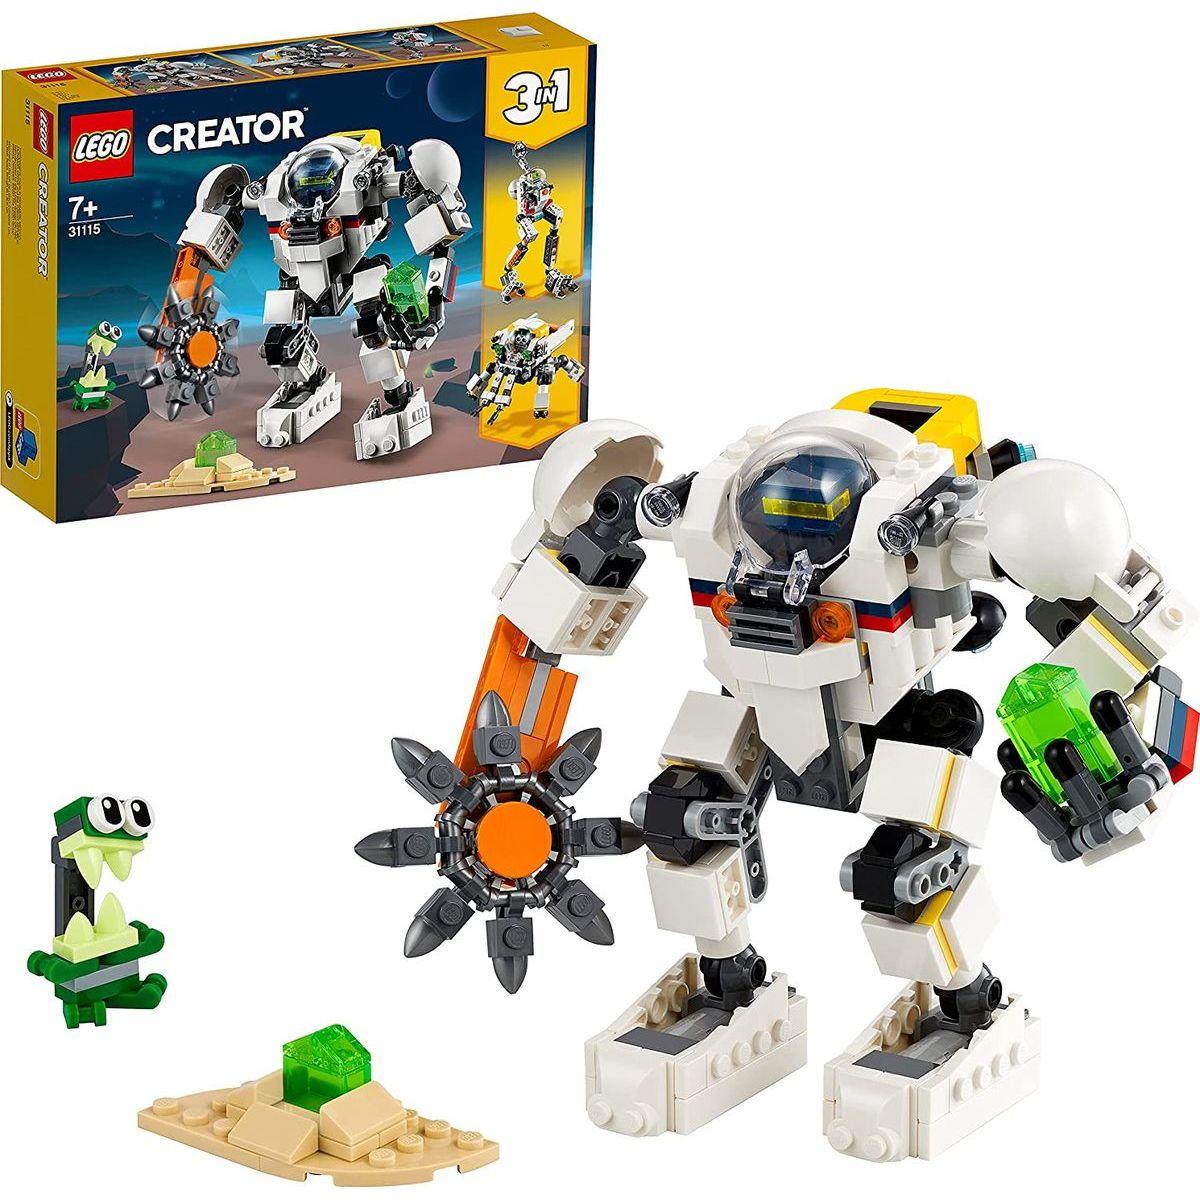 LEGO® Creator 31115 Vesmírny ťažobný robot